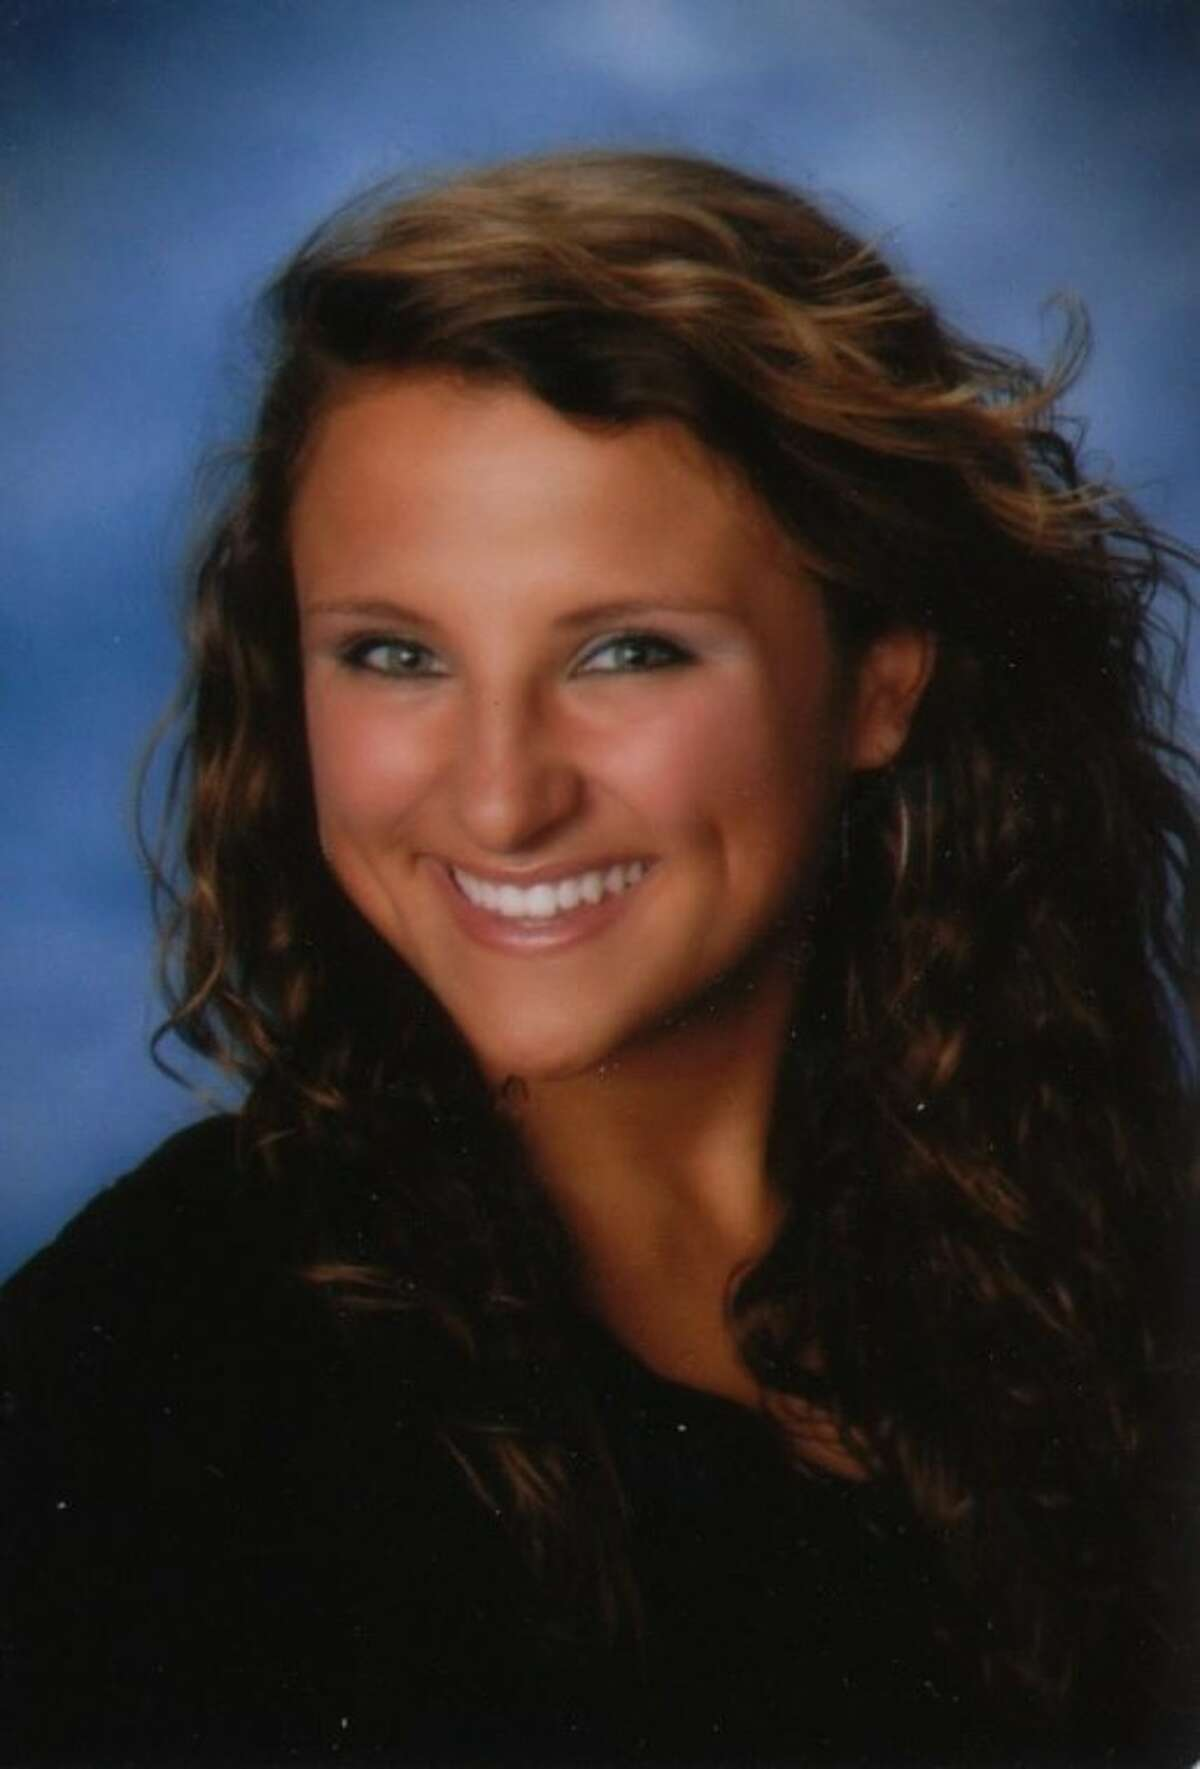 Allie Souza of Westhill has won the 2012 Allyson Rioux Scholarship Award.